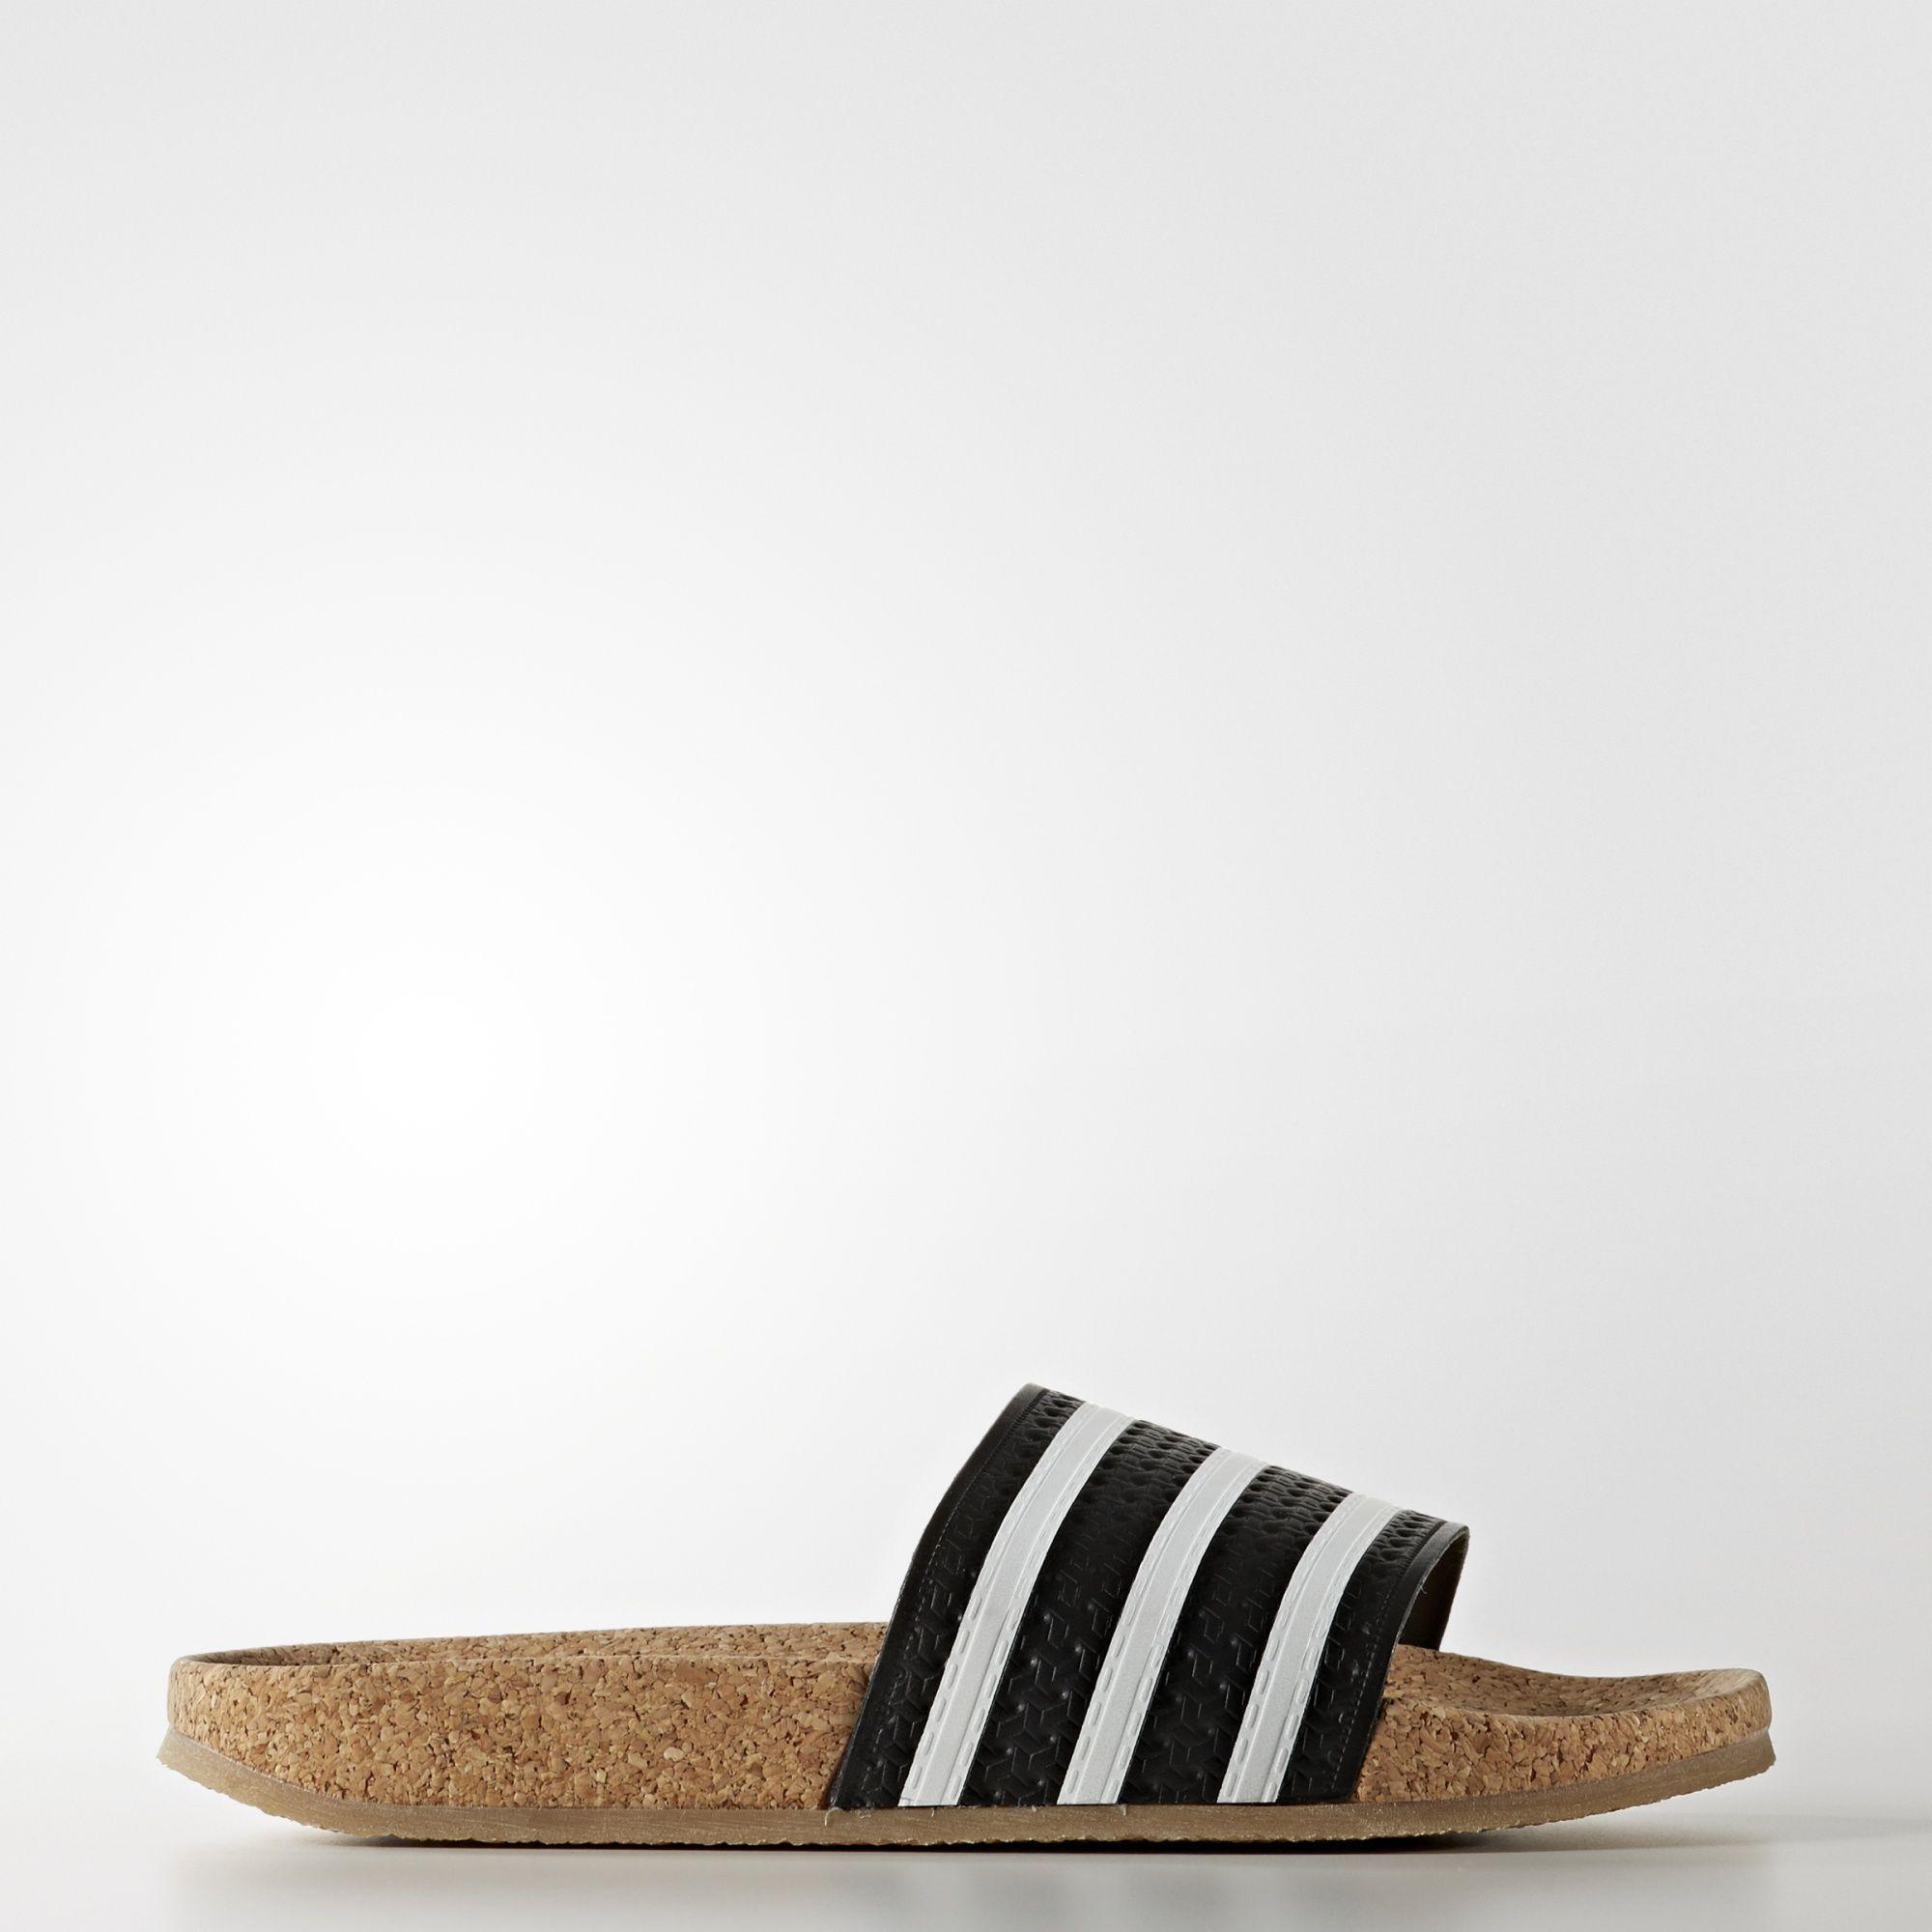 adidas - adilette Cork Slides   Adiletten, Frauen sandalen ...